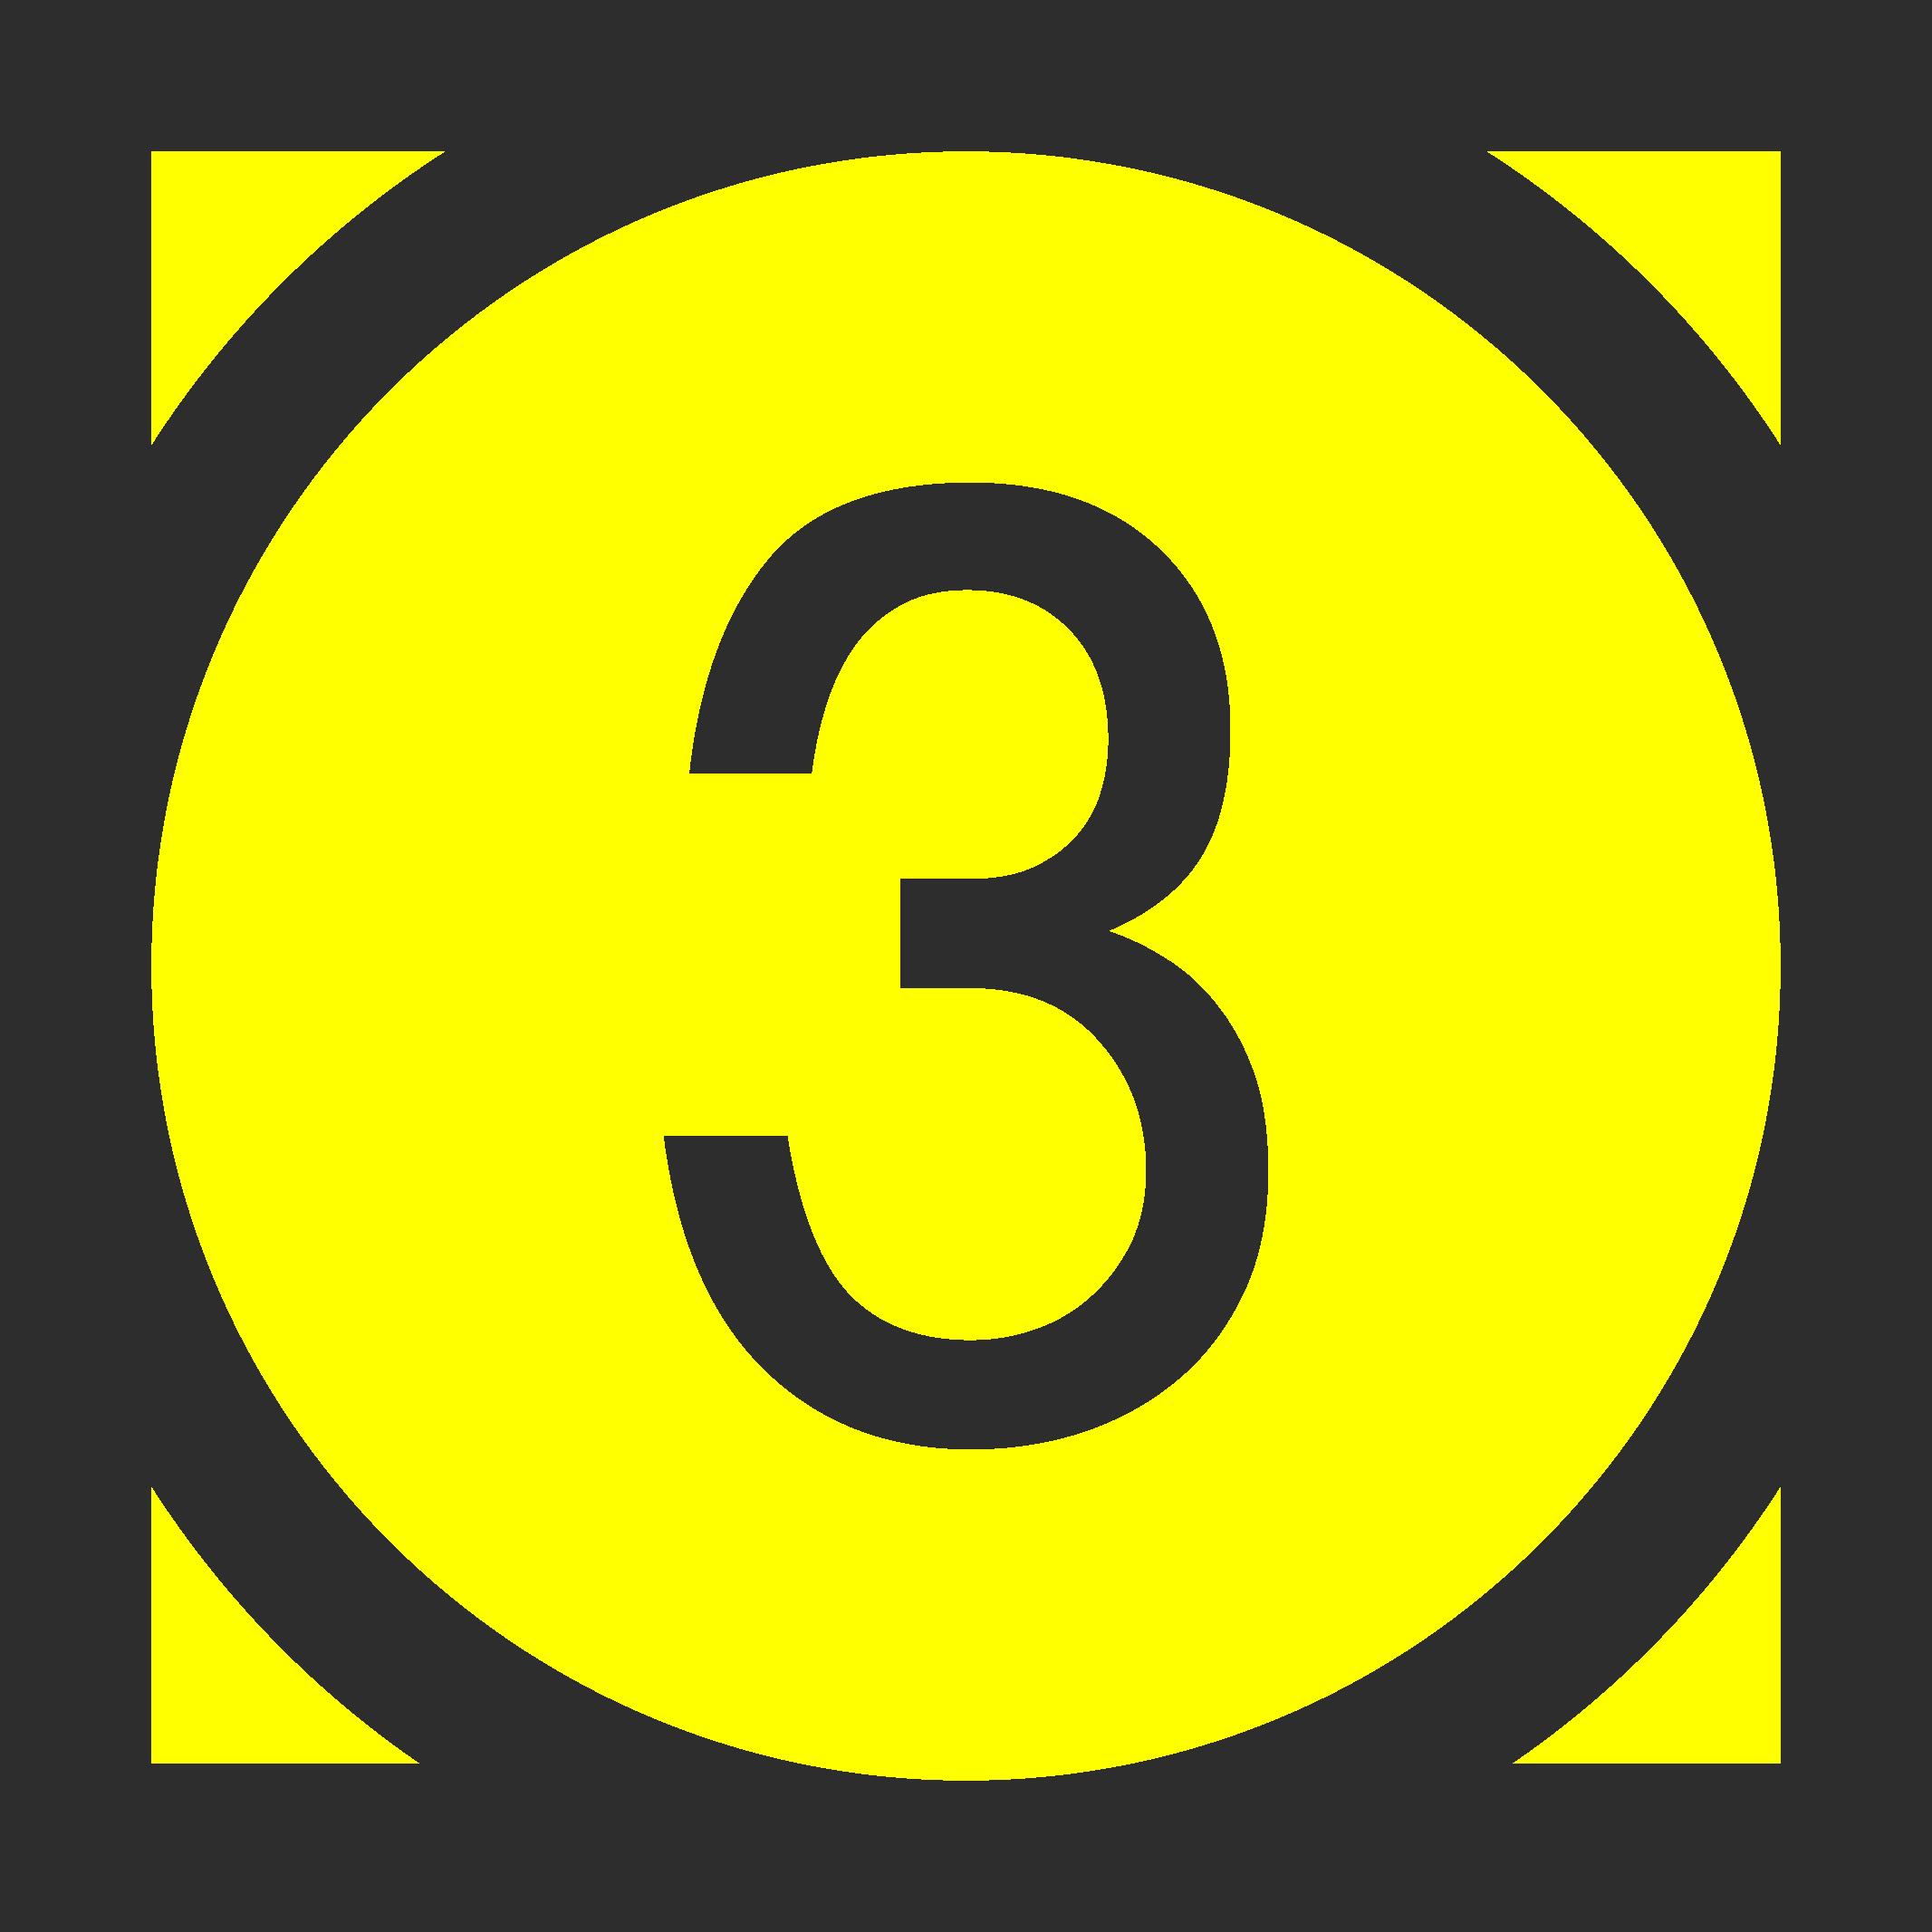 Третье